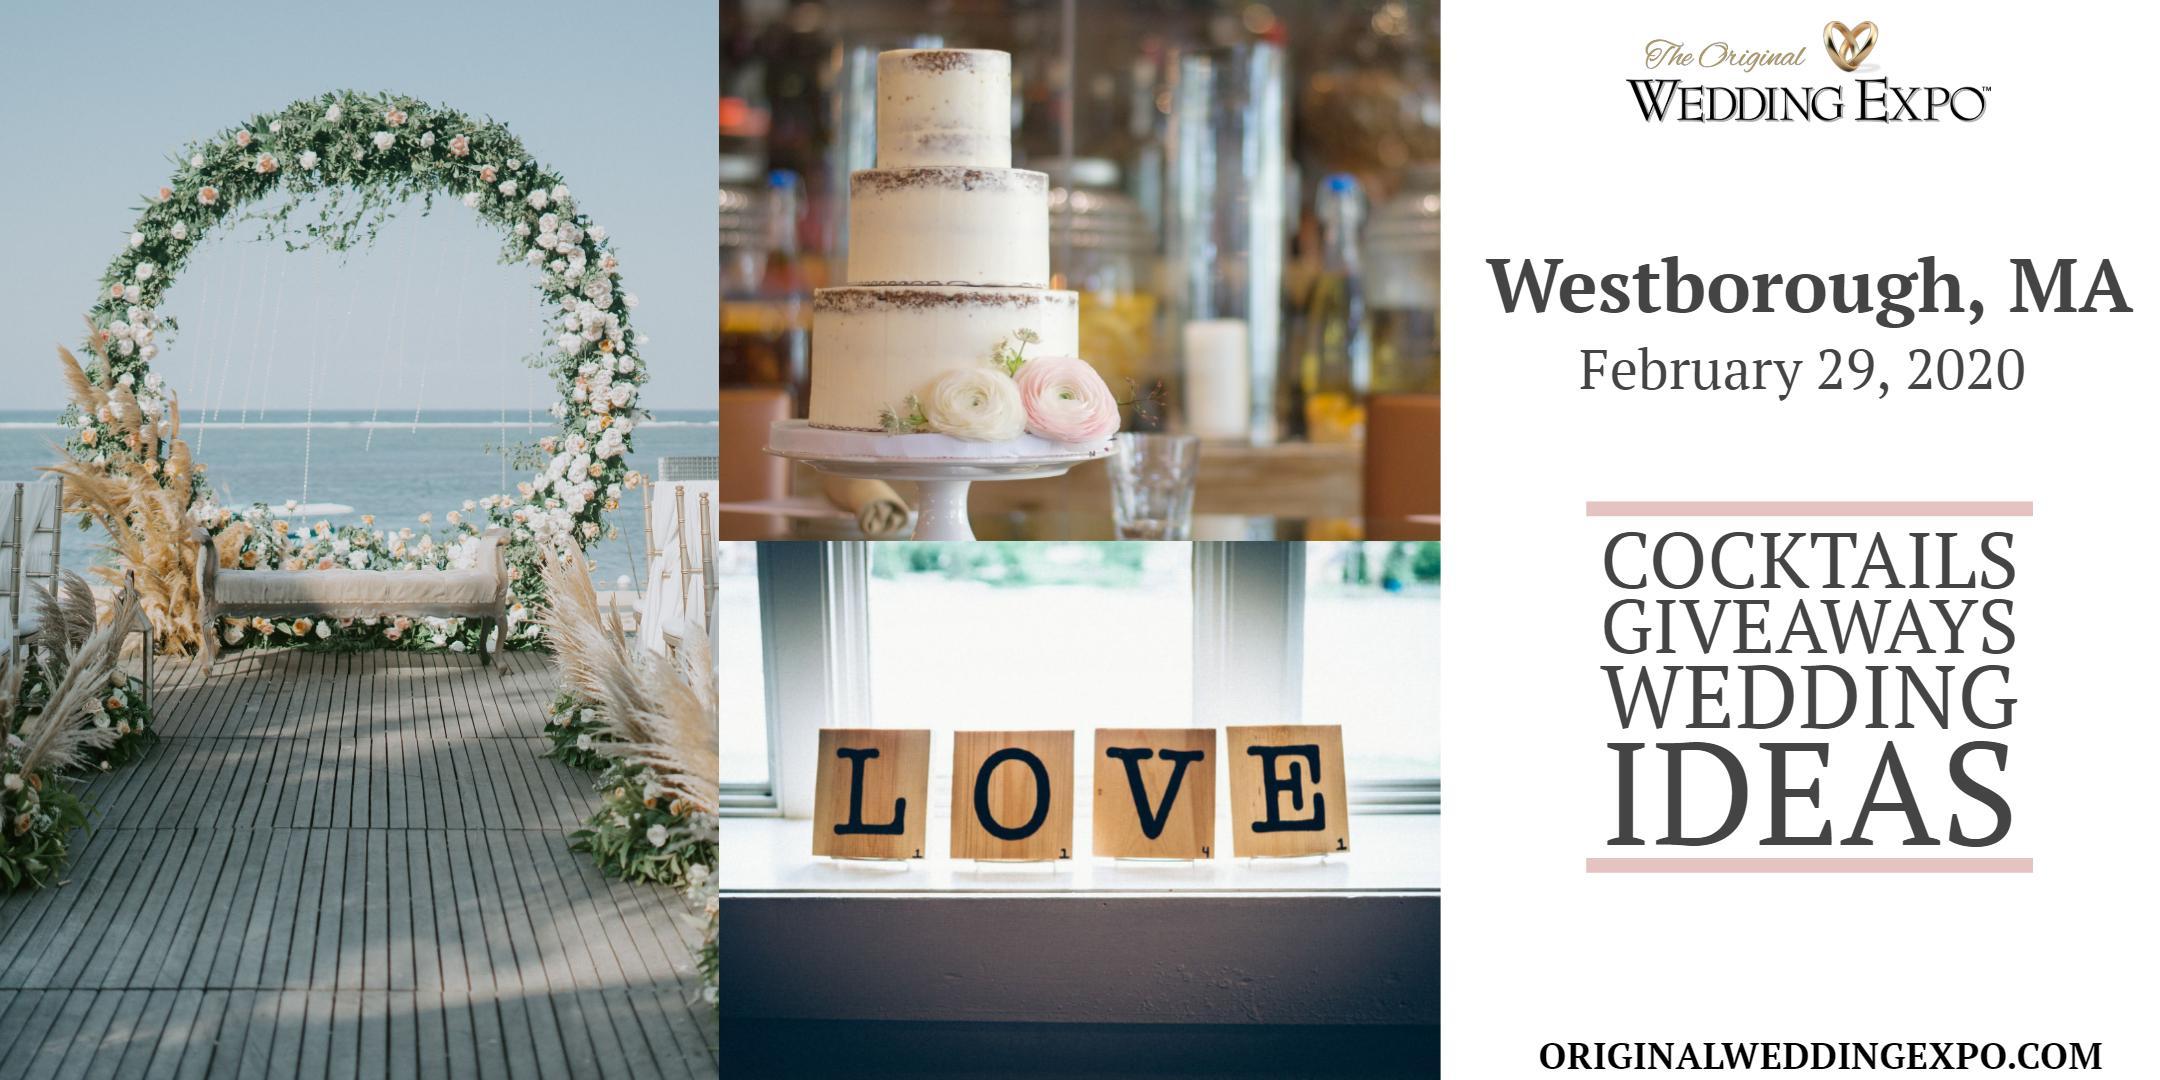 The Original Wedding Expo 29 Feb 2020